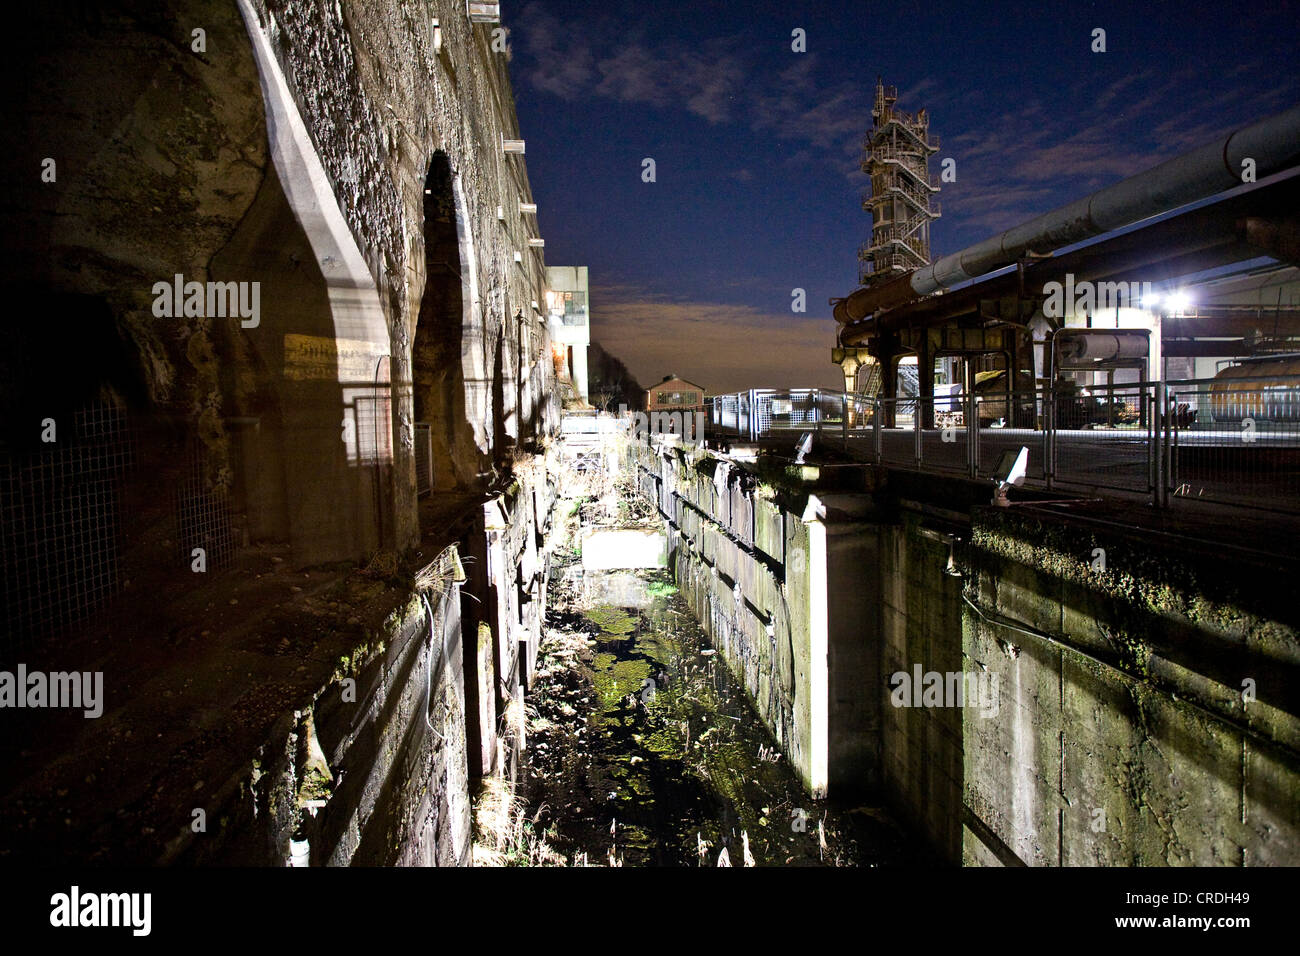 steelwork Henrichshuette at night, Germany, North Rhine-Westphalia, Ruhr Area, Hattingen - Stock Image